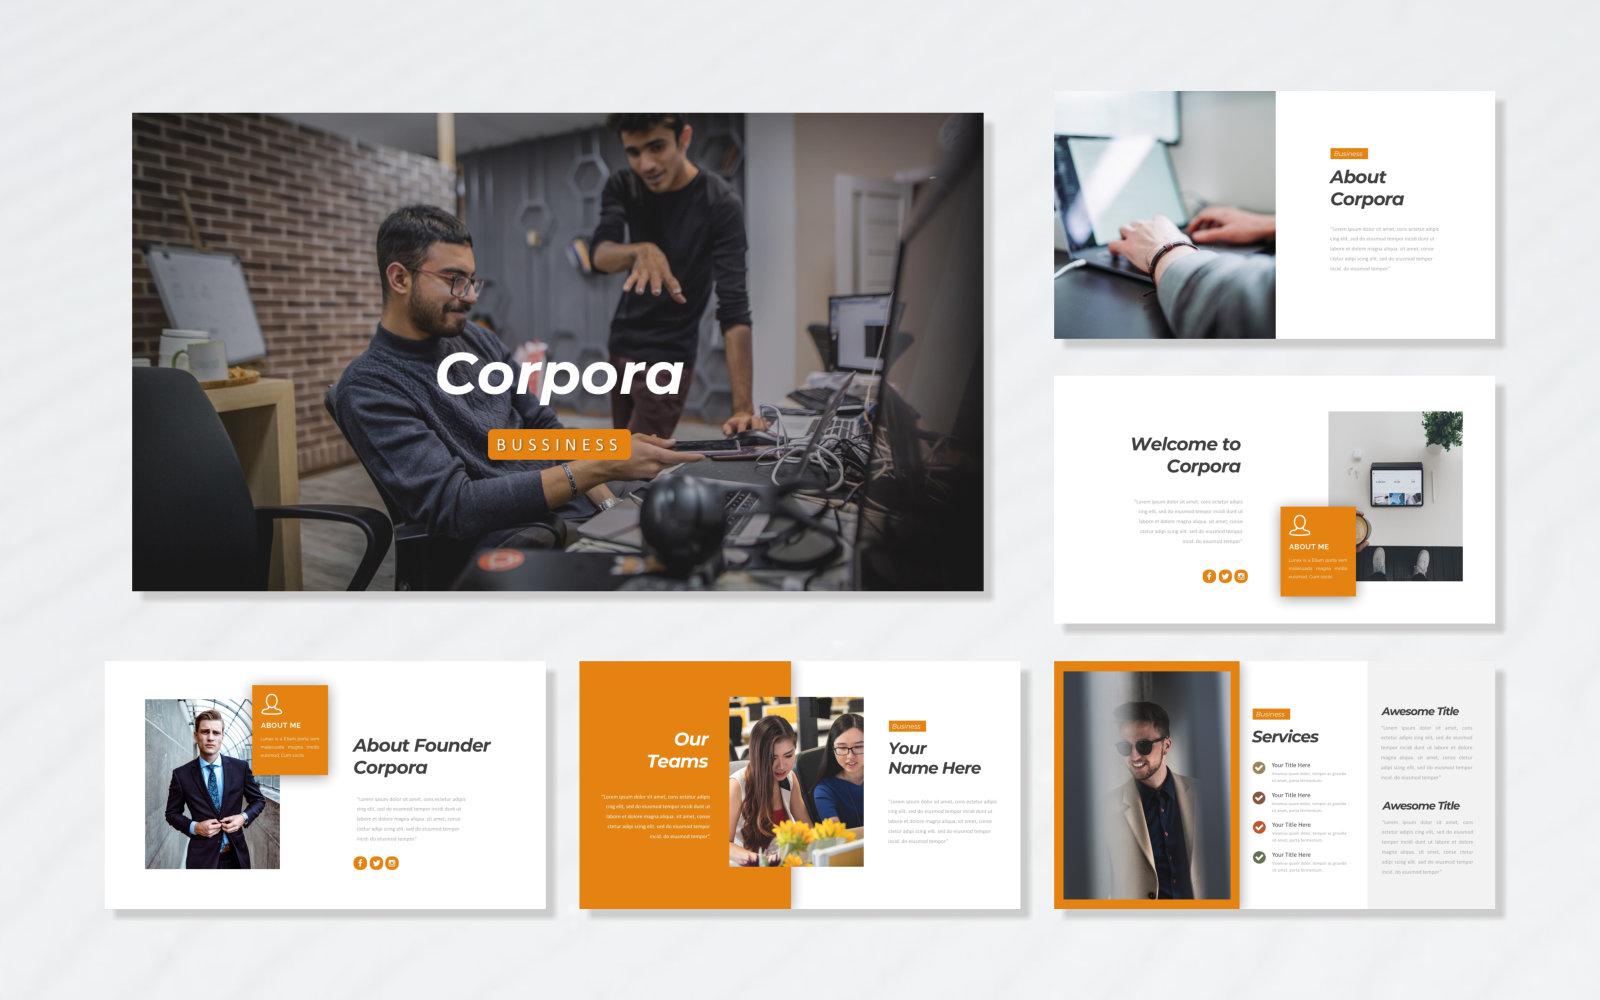 Corpora - Bussiness PowerPoint Template